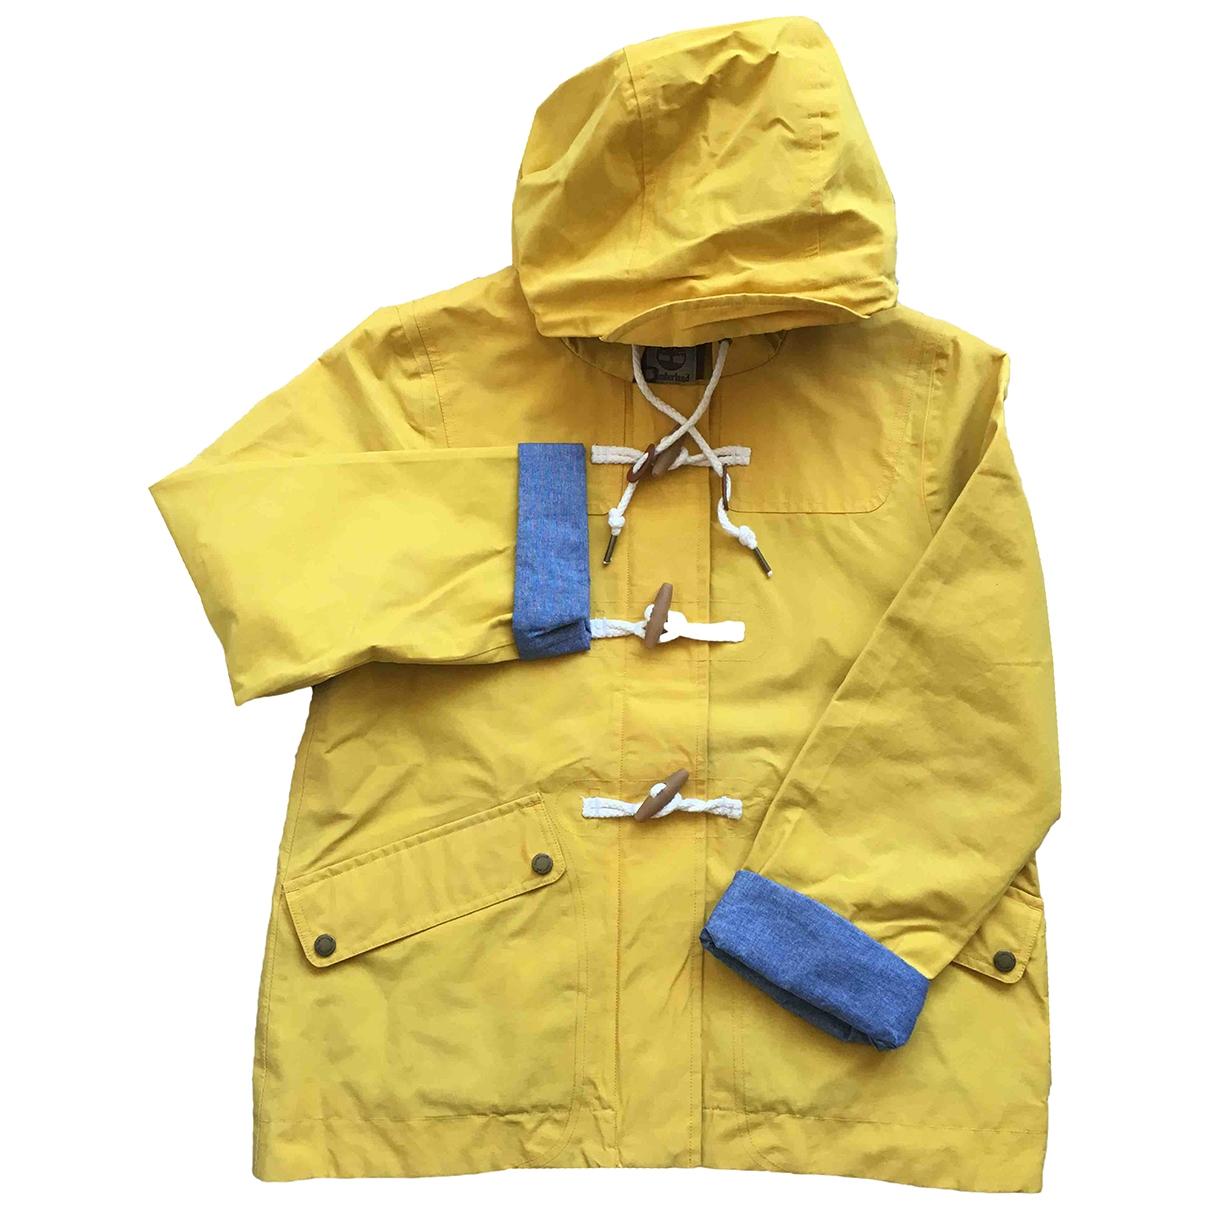 Timberland \N Yellow Cotton jacket for Women M International